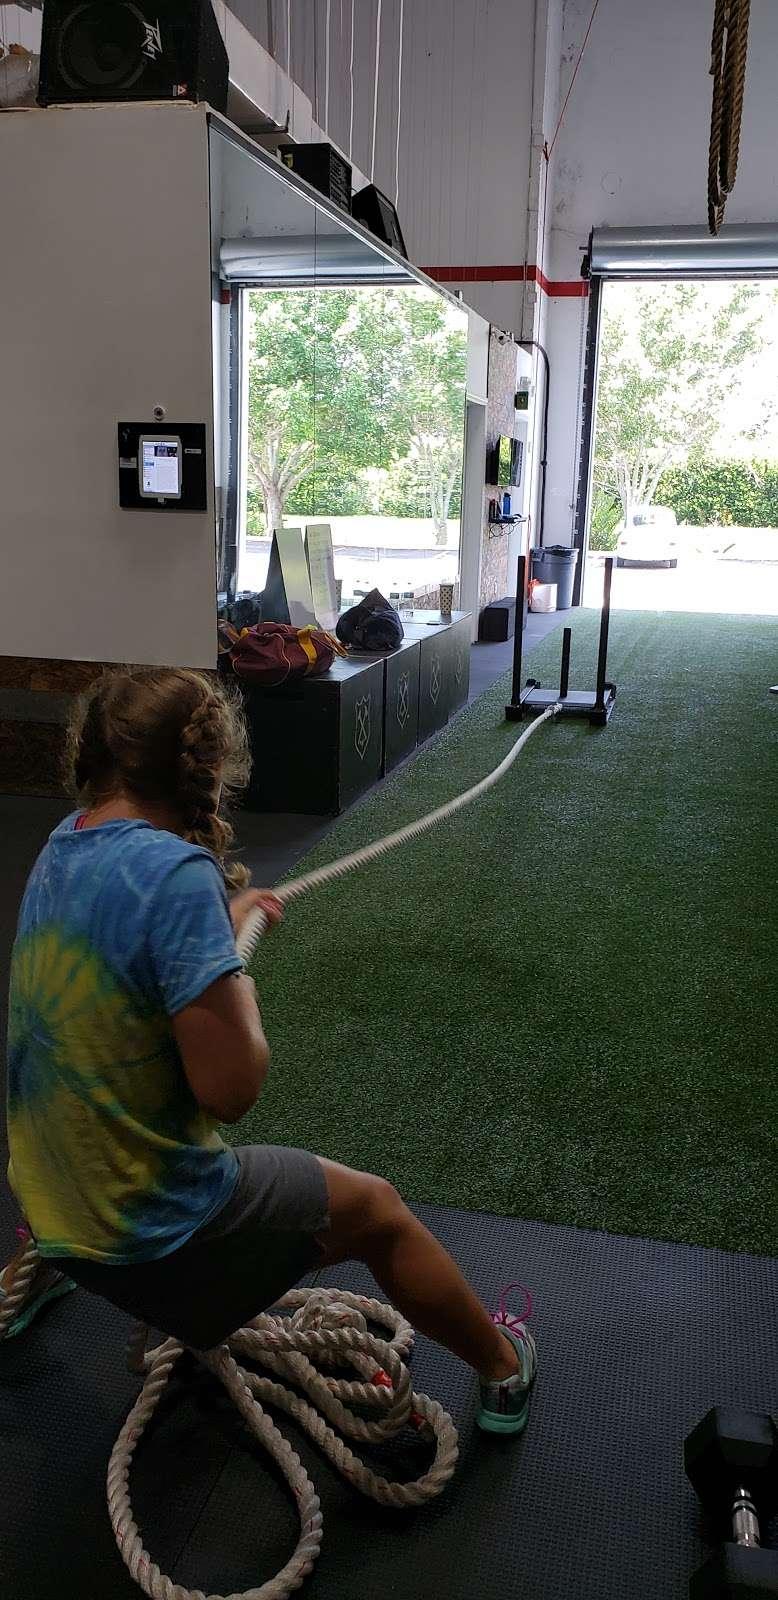 Mission Fit - gym  | Photo 1 of 1 | Address: 20851 Johnson St # 120, Pembroke Pines, FL 33029, USA | Phone: (786) 202-6662